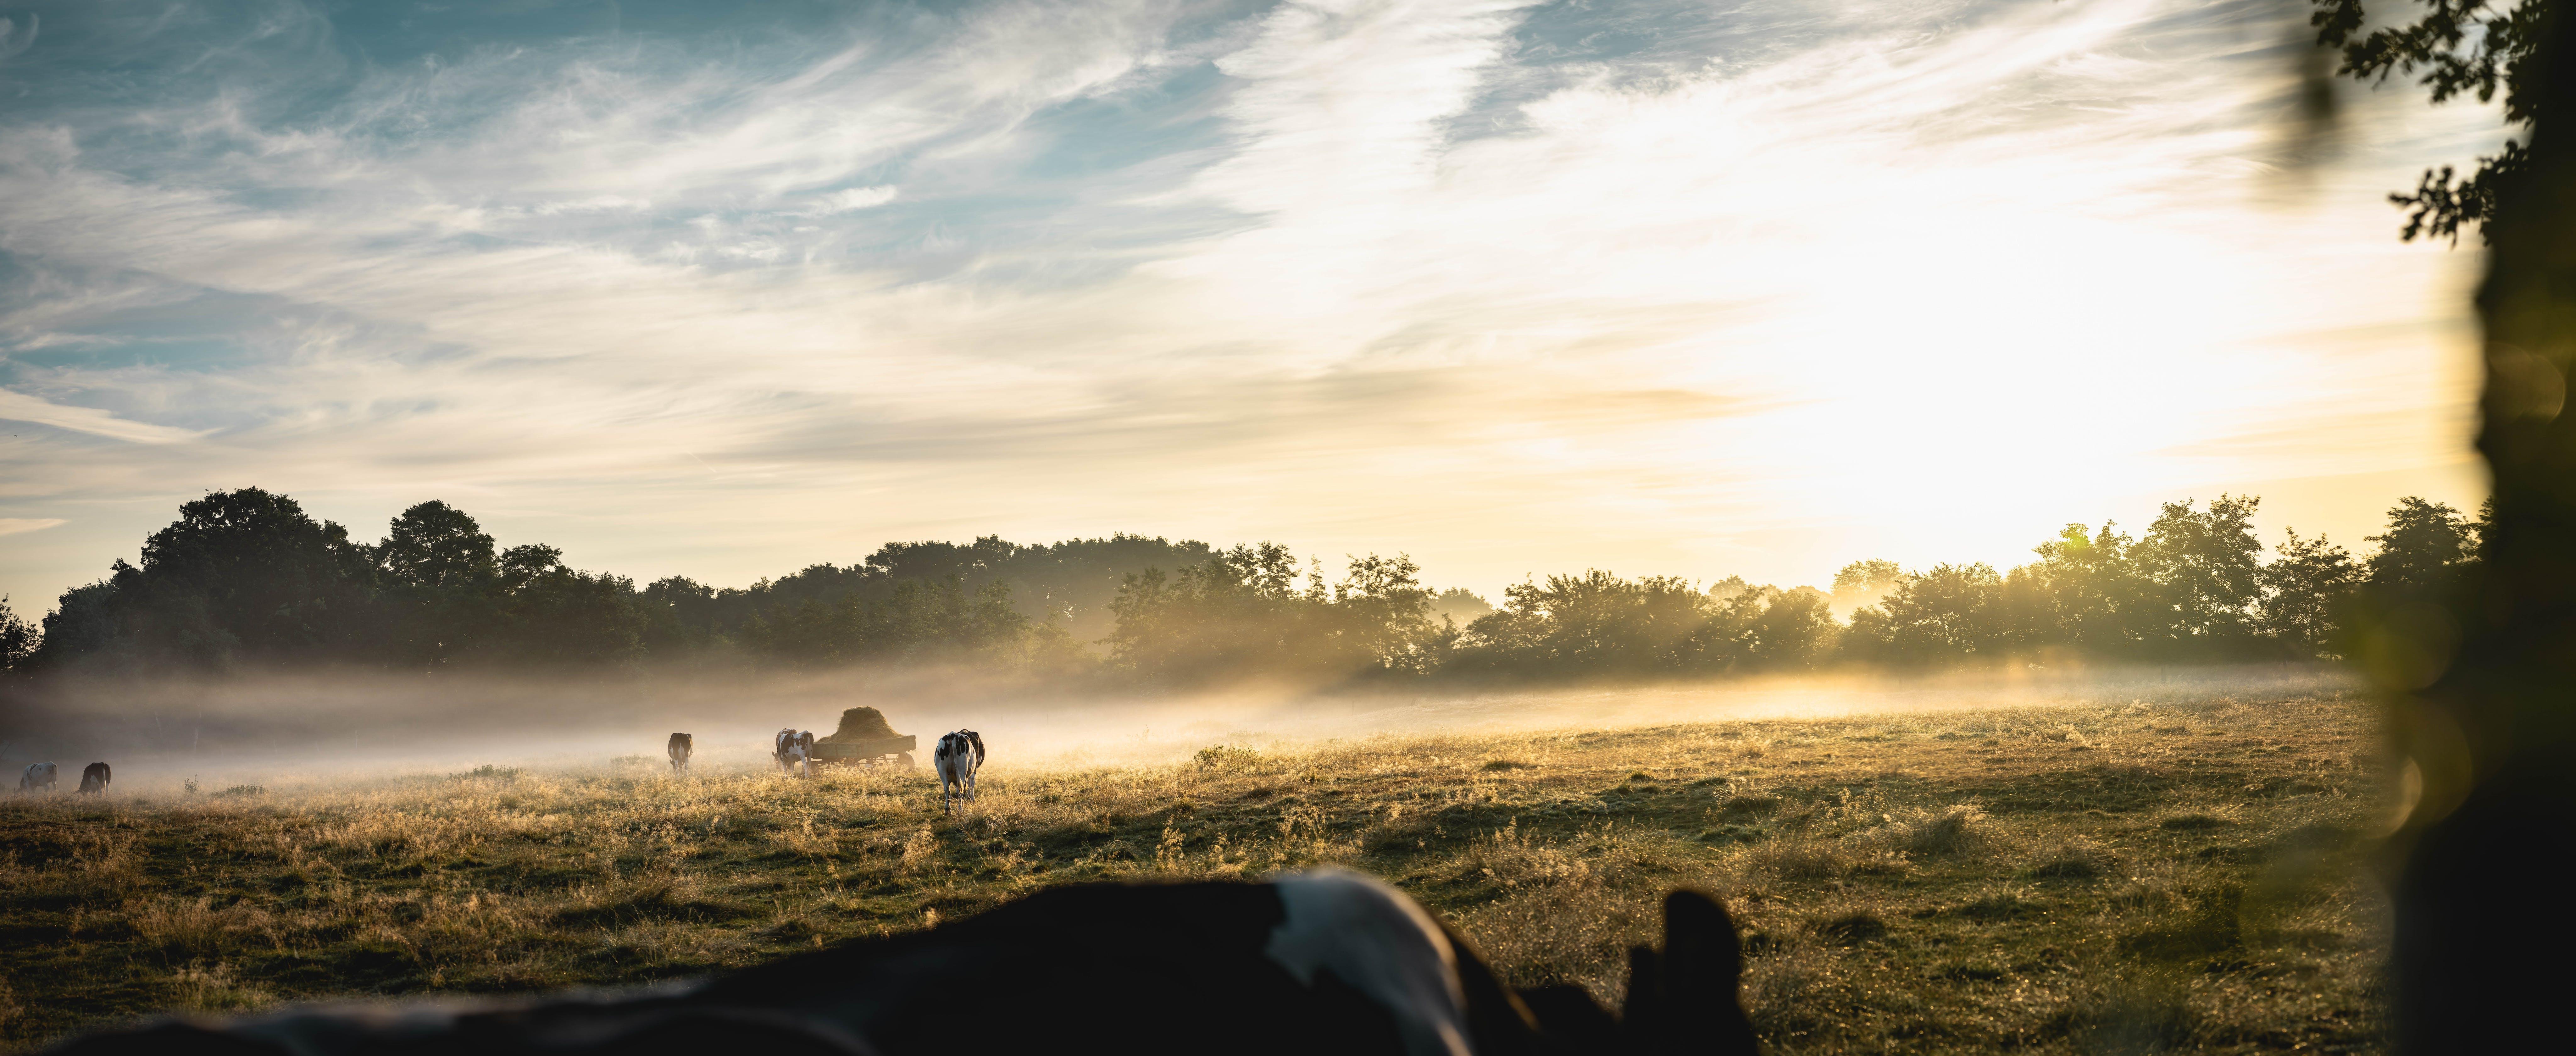 Animals Walking on Grass Field